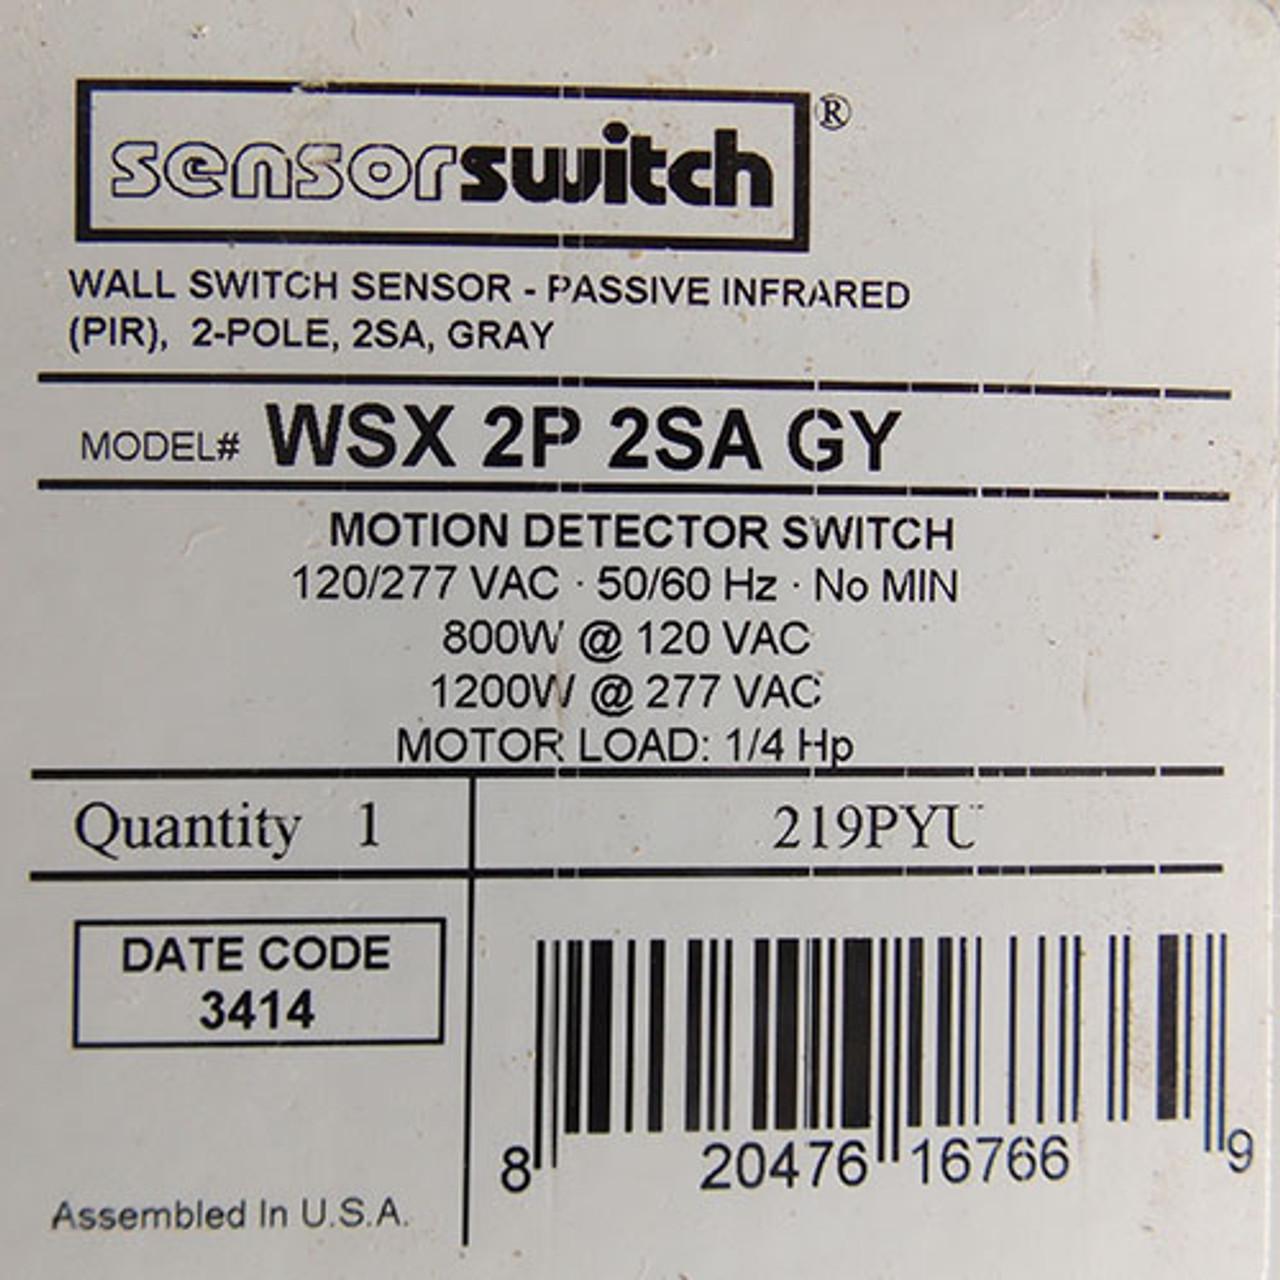 SensorSwitch WSX2P2SAGY Wall Switch Occupancy Sensor, Passive Infrared, Gray - New